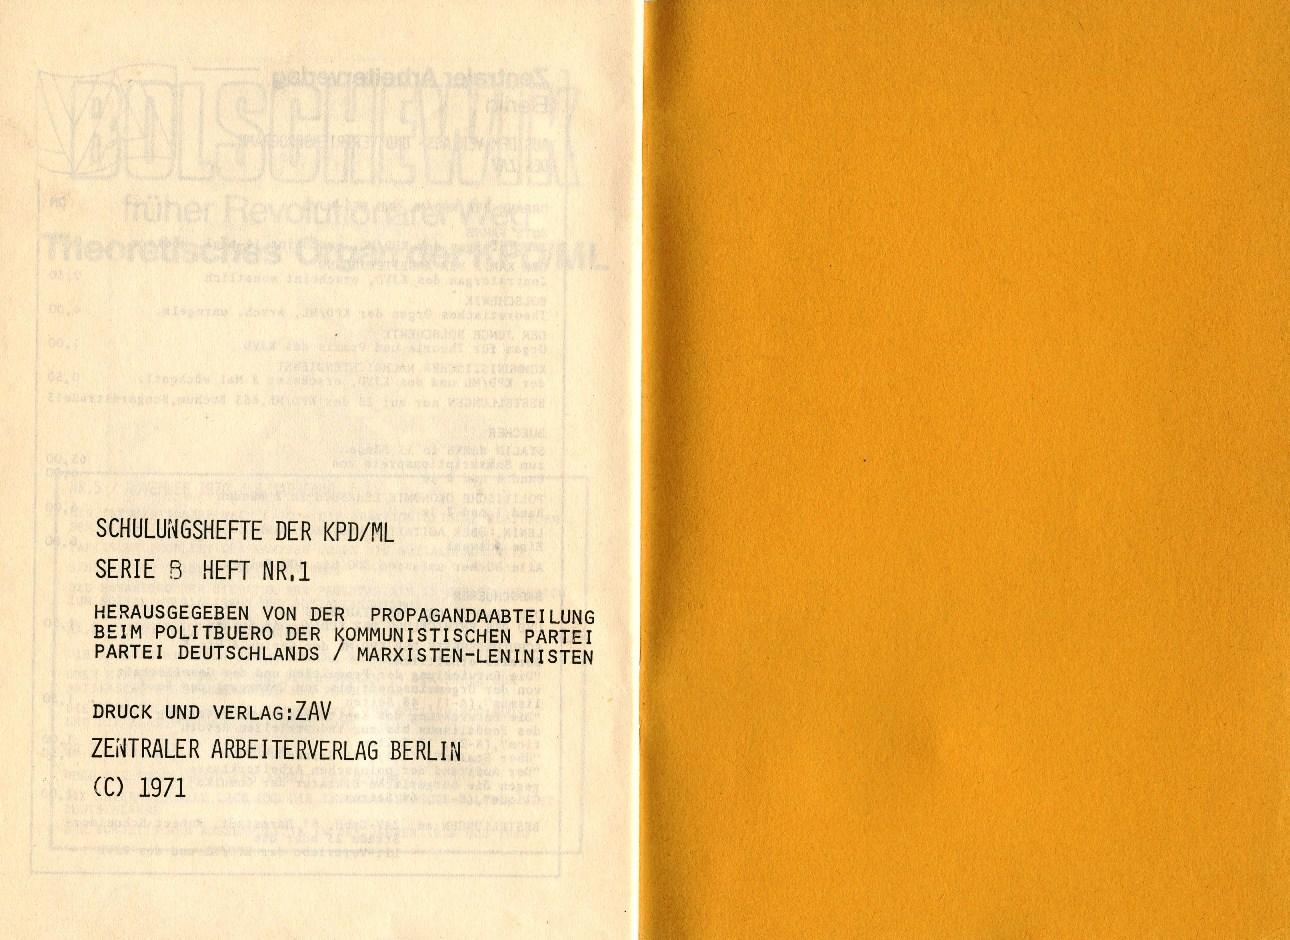 ZB_Mao_Revolutionstheorie_1971_18